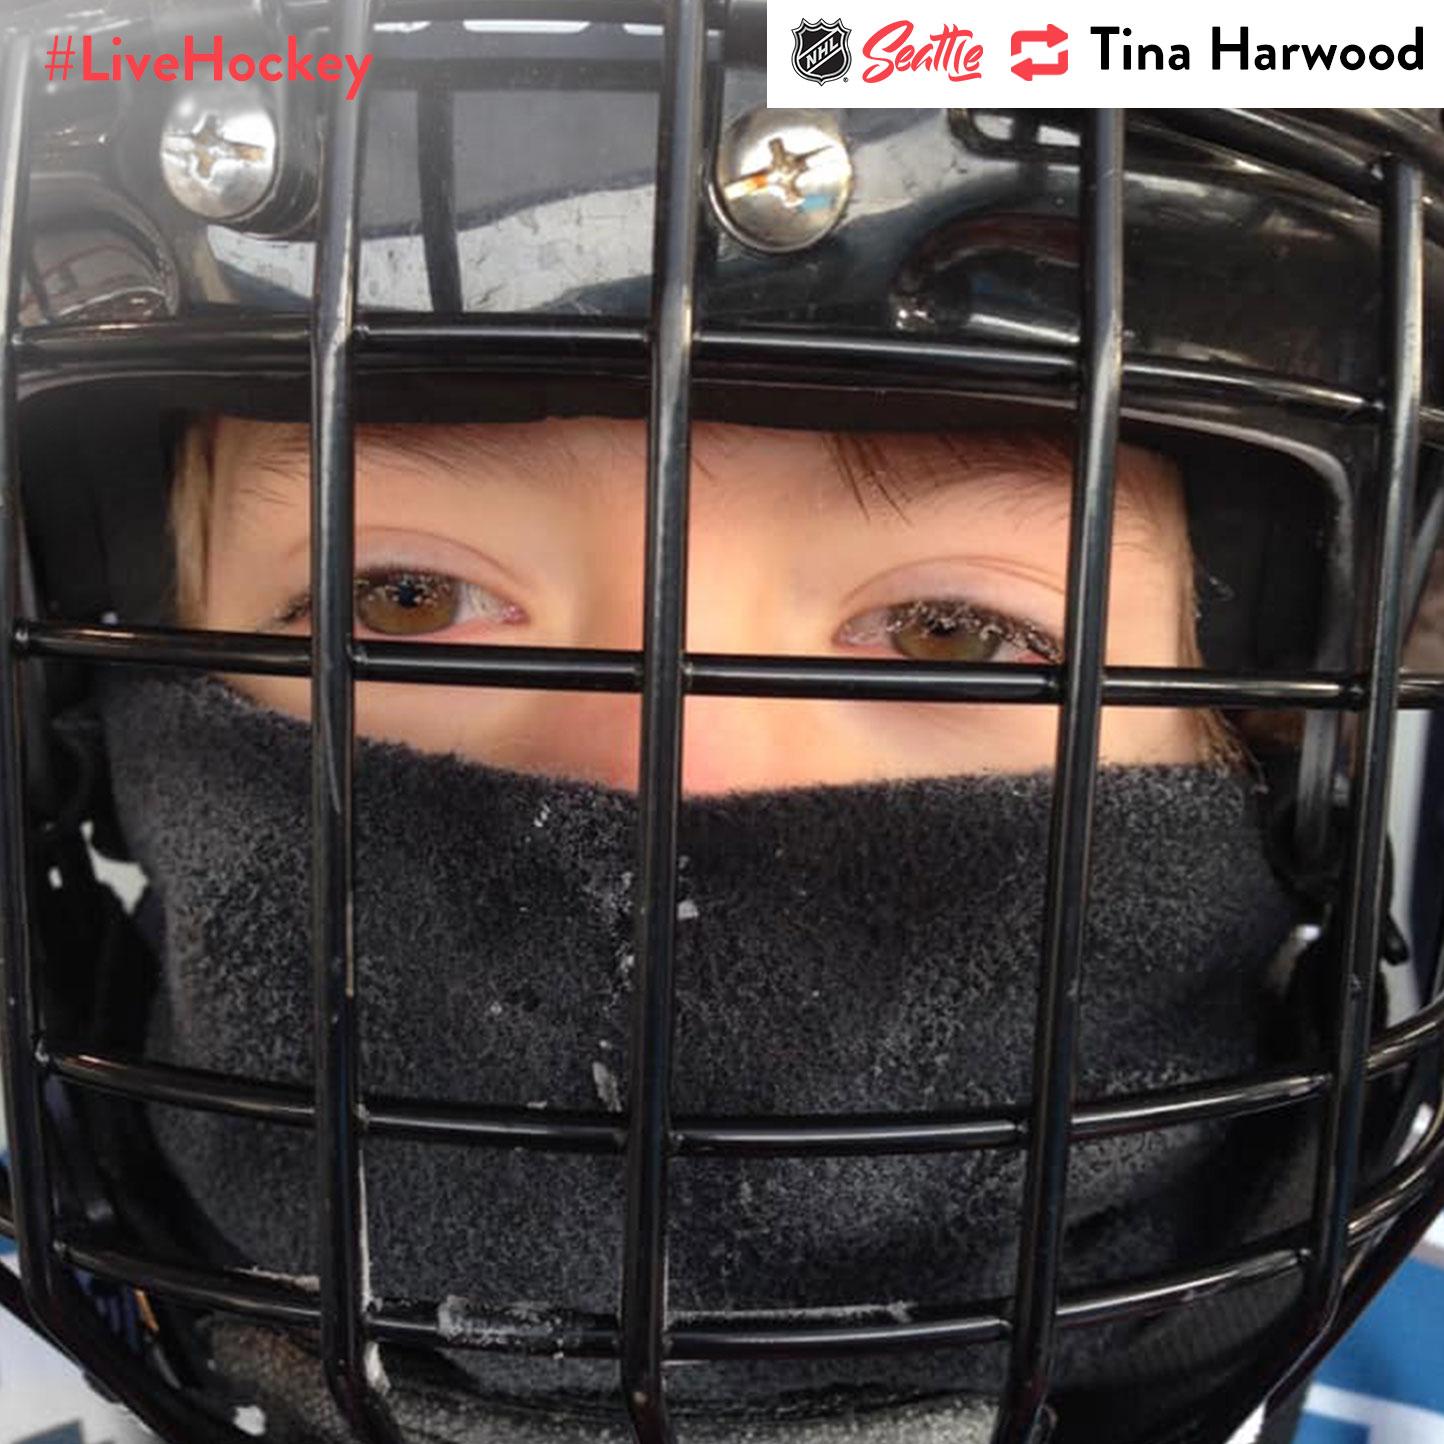 """Playing Hockey in -1 F in Moses Lake, WA 👊 🏒 🥅 #Live Hockey"""